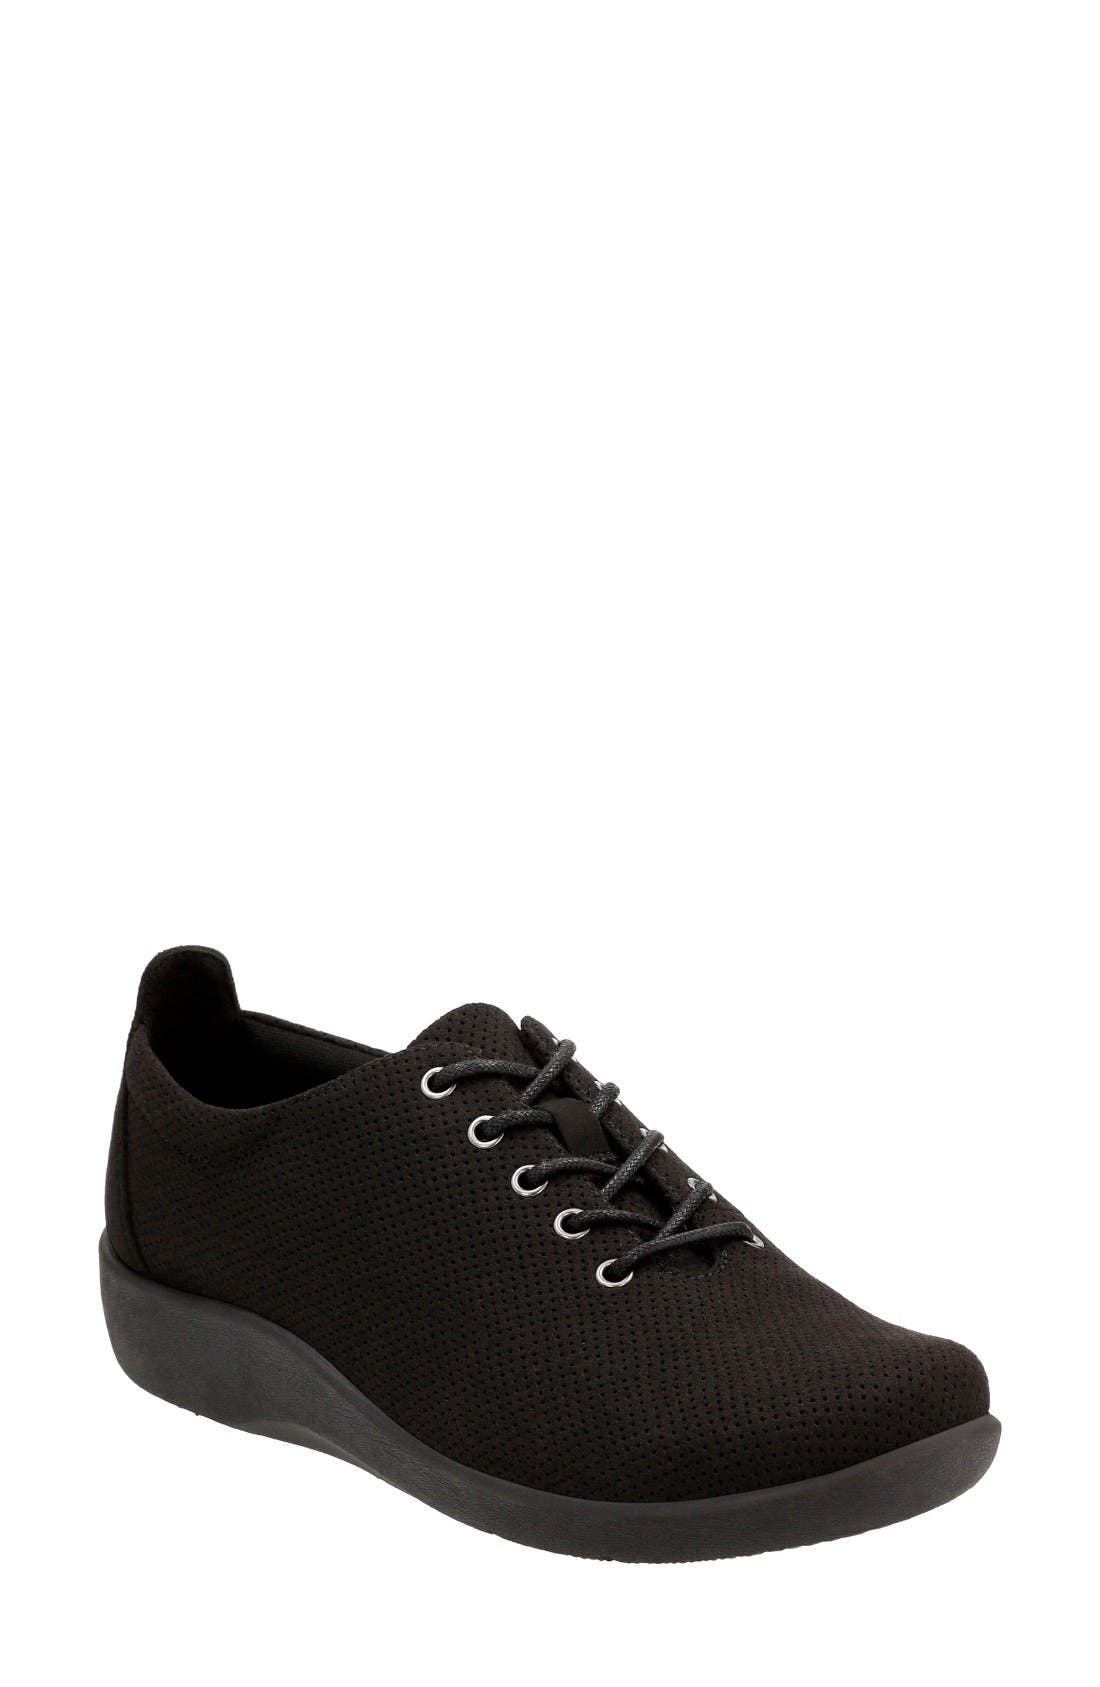 CLARKS® ORIGINALS Clarks® 'Sillian - Tino' Sneaker